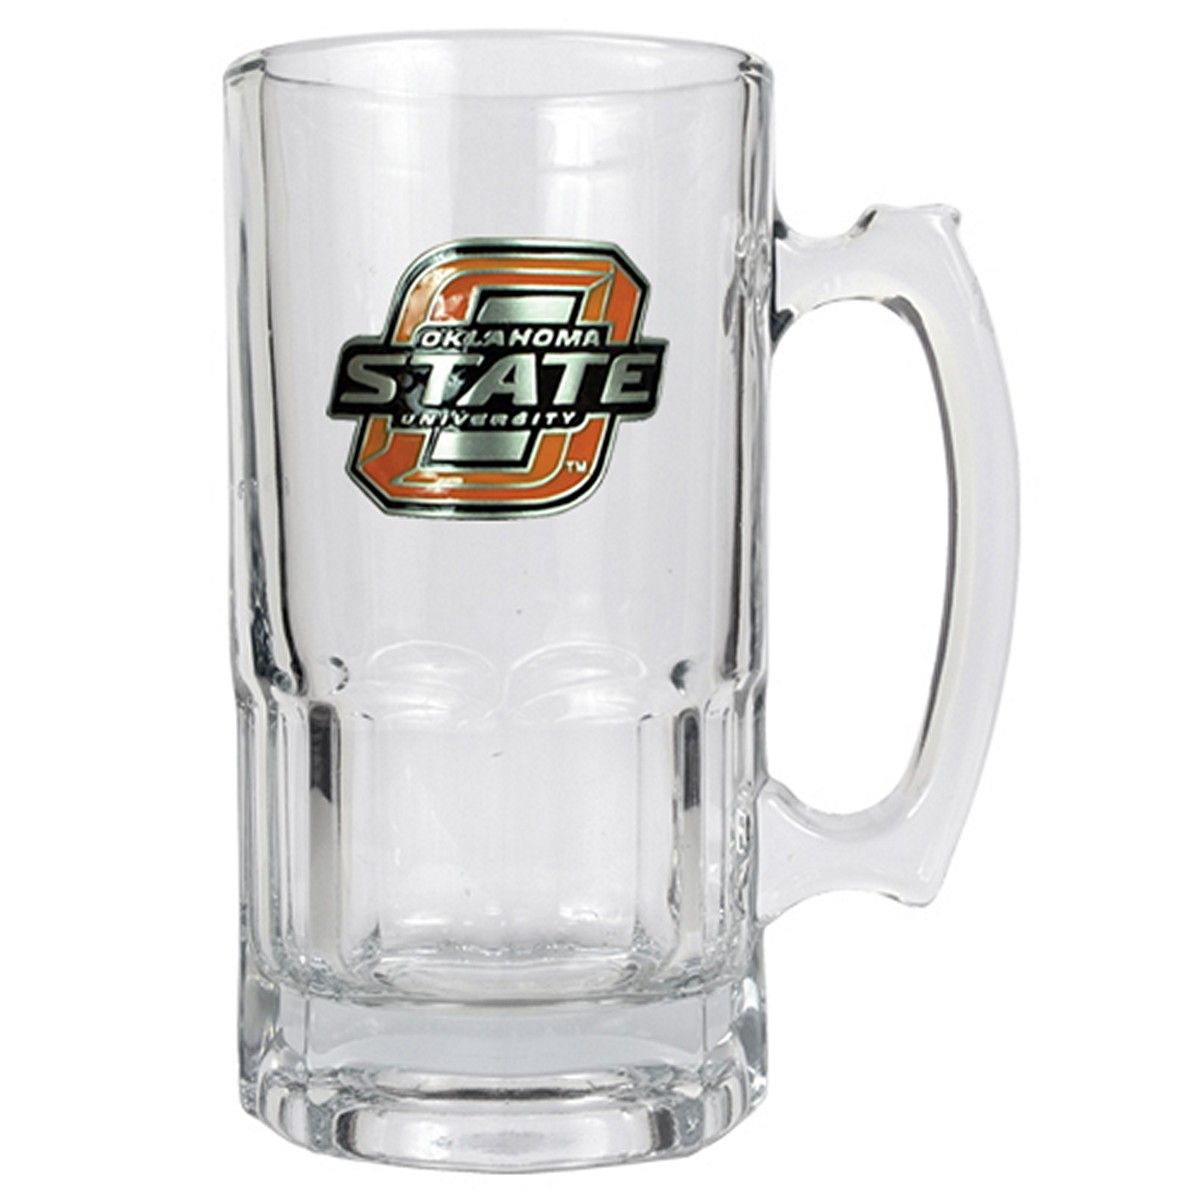 Oklahoma State University Large Beer Mug (Engravable)